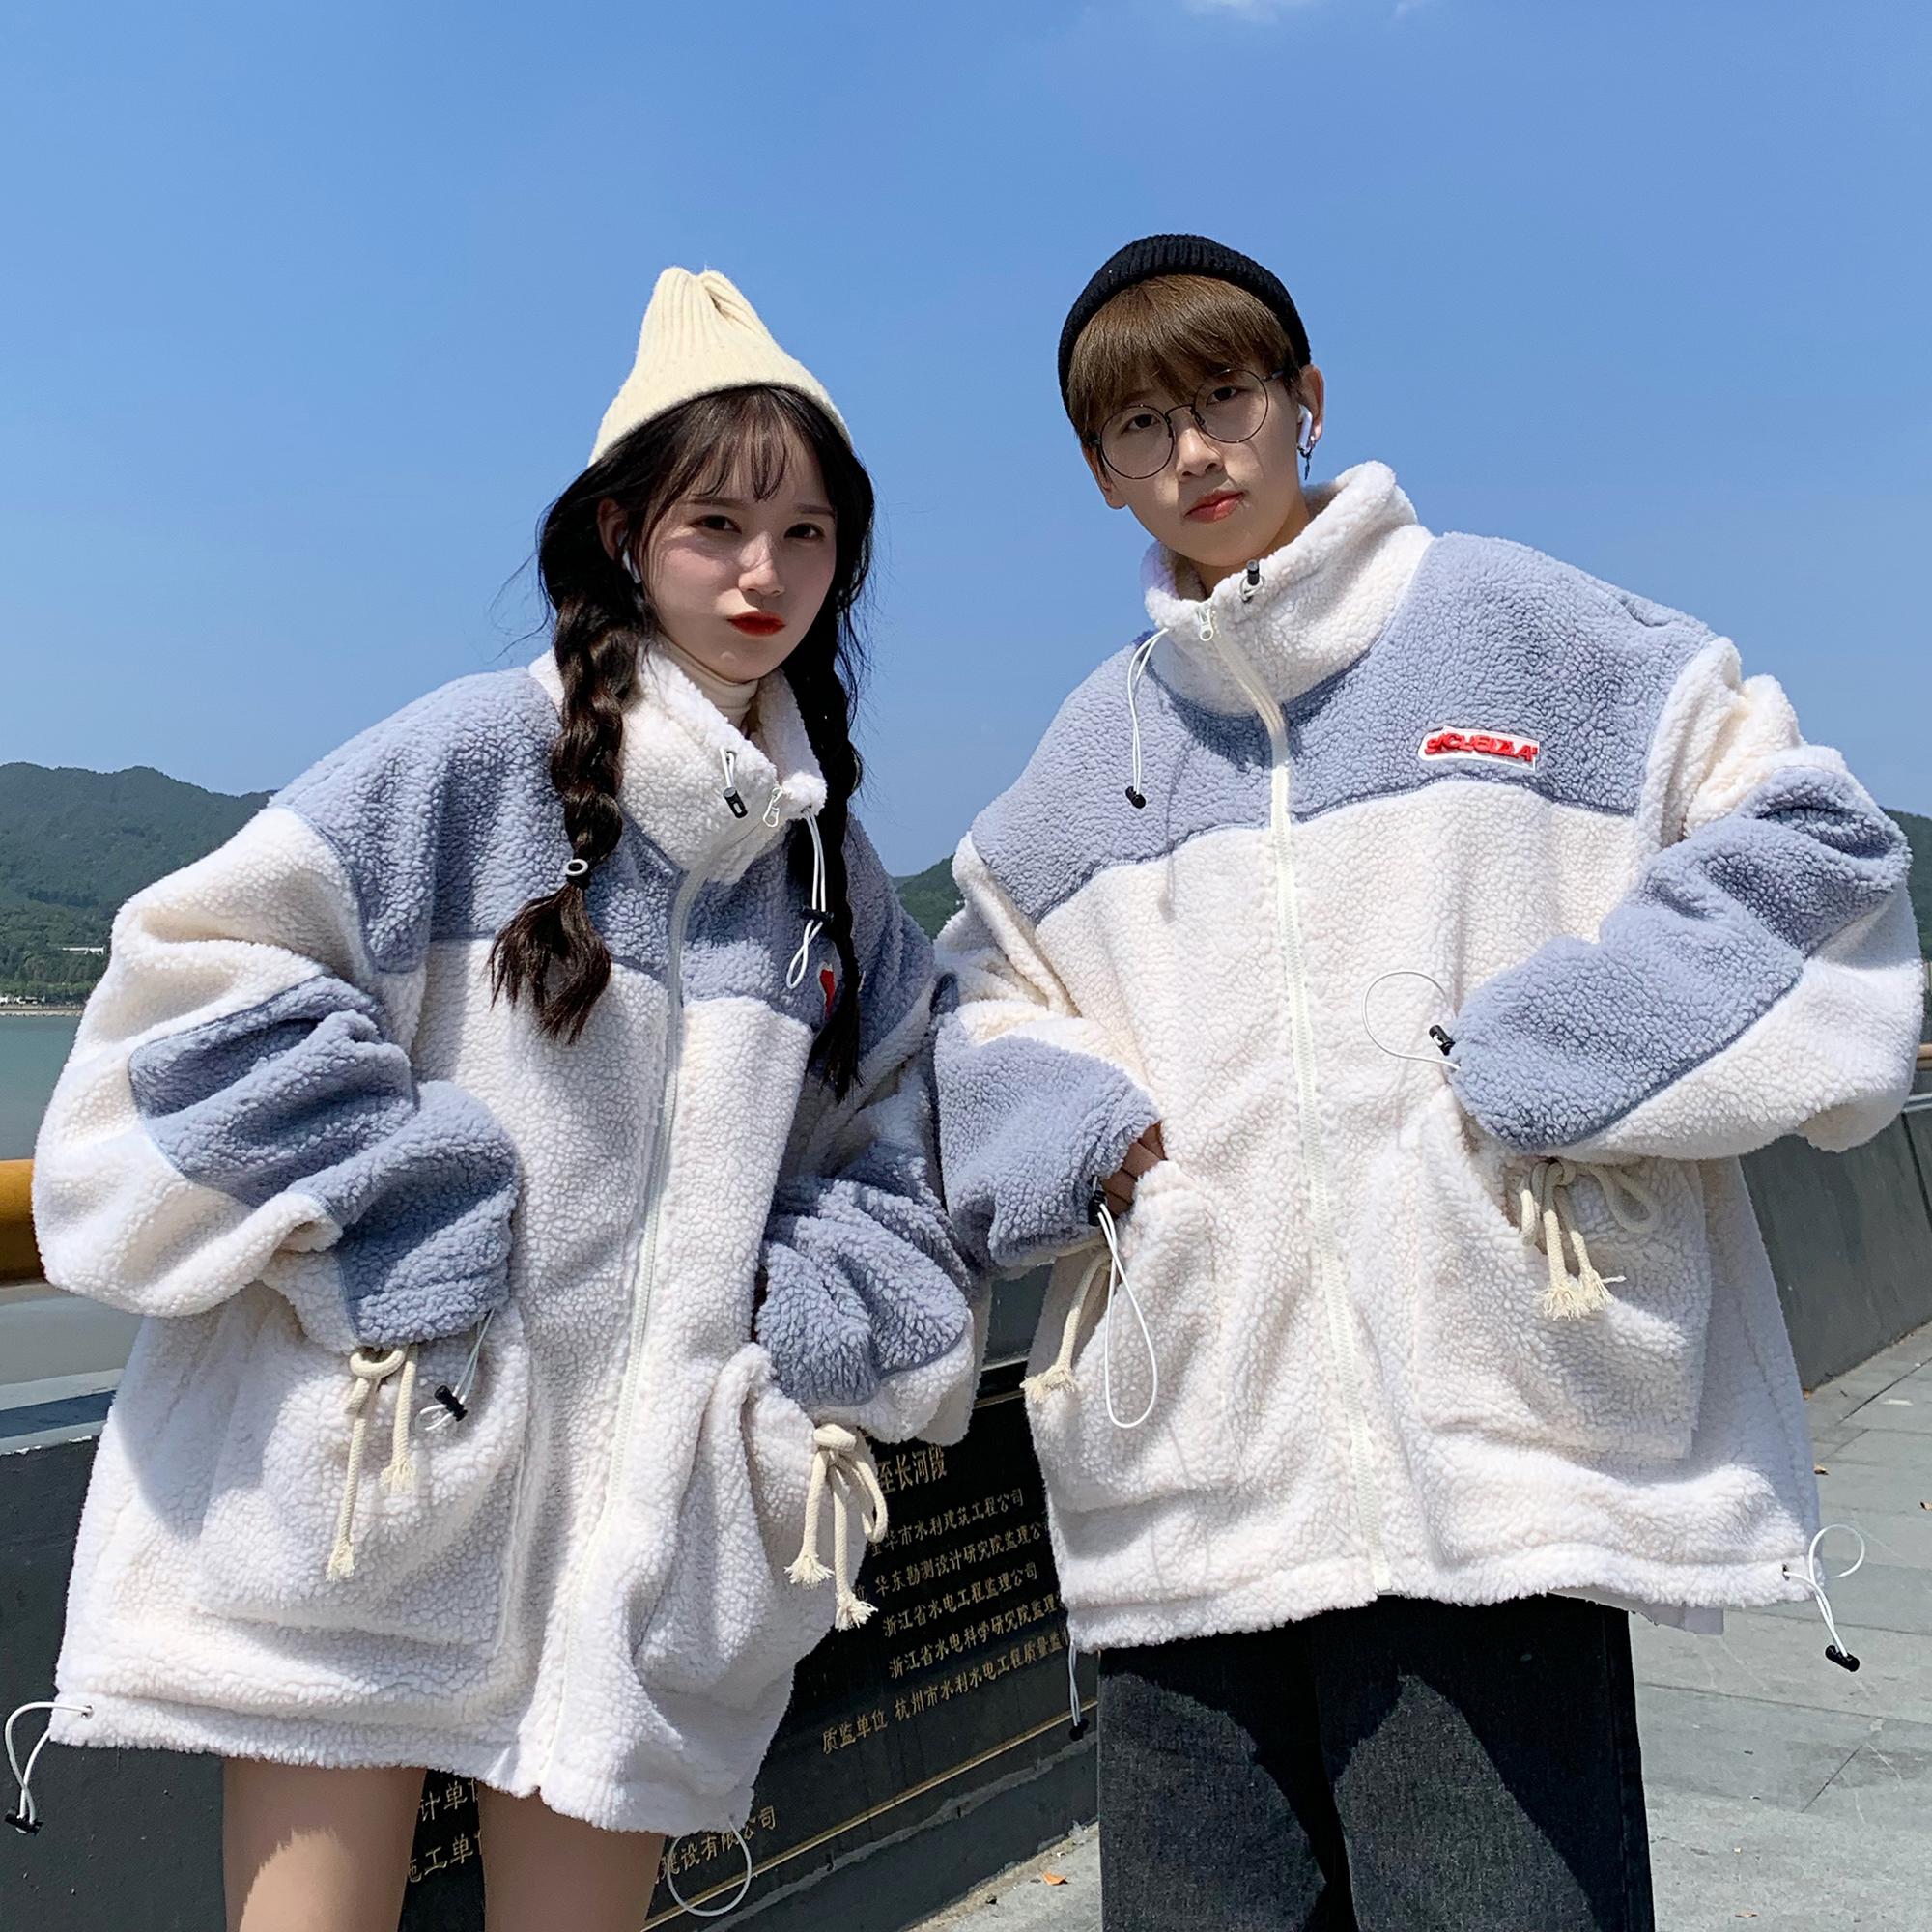 C316 W9016 P115冬装加棉加厚棉衣情侣装男女款港风外套羊羔毛